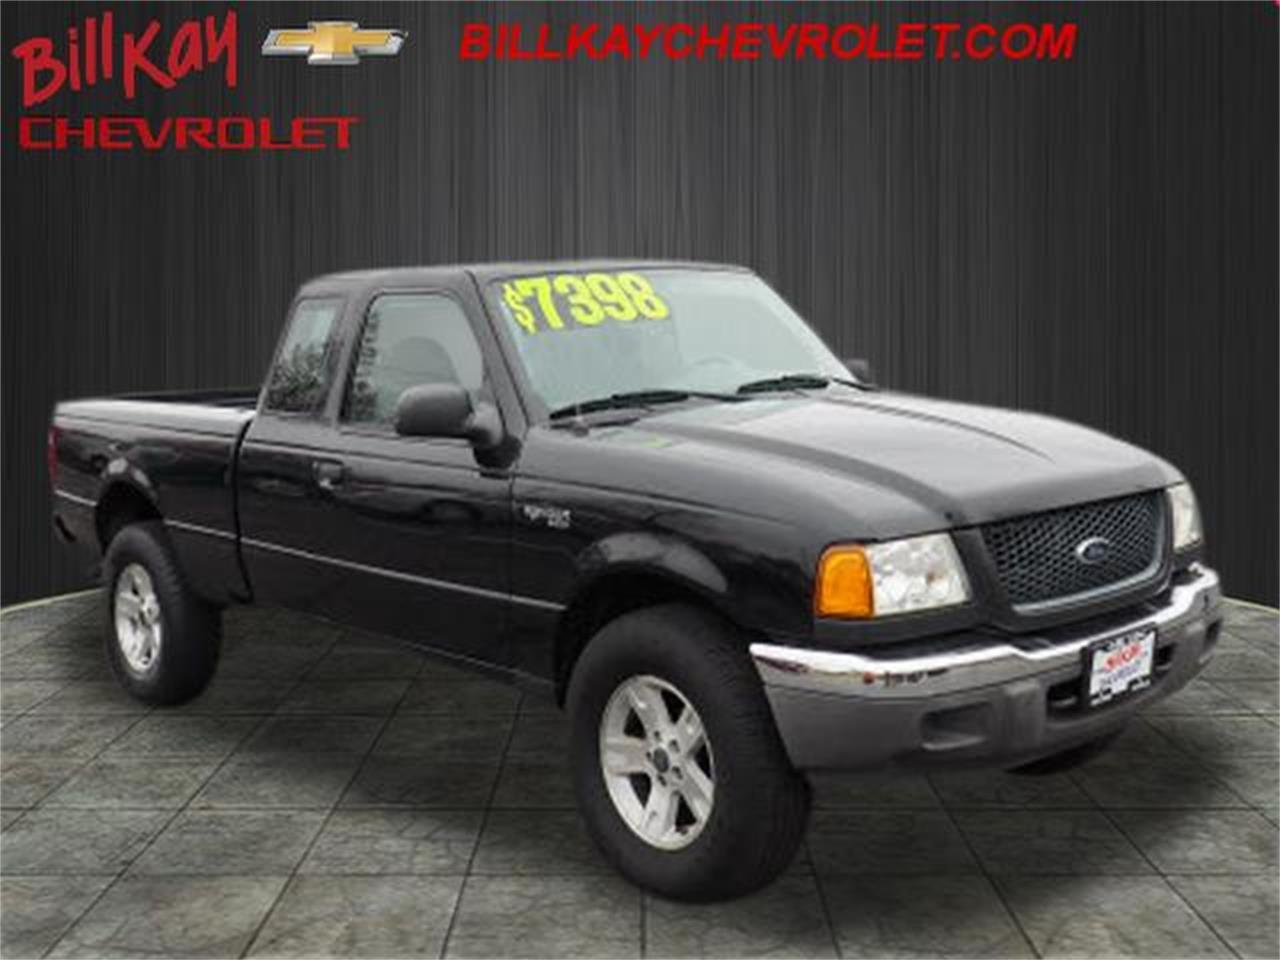 2003 Ford Ranger For Sale >> 2003 Ford Ranger For Sale Classiccars Com Cc 1164034